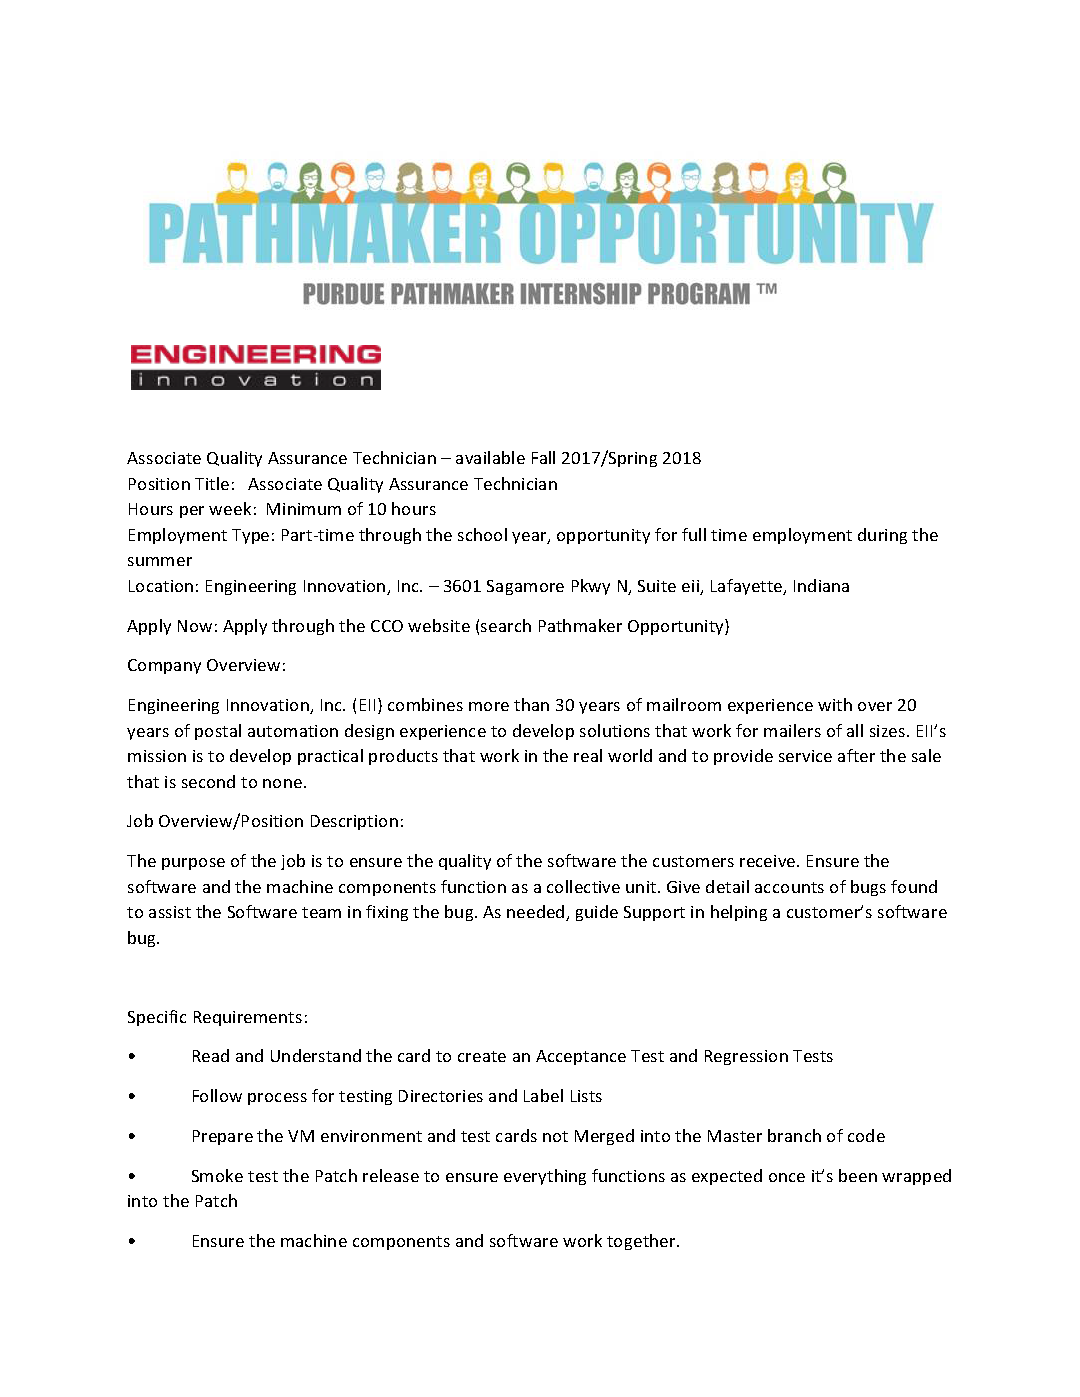 Pathmaker Opportunity Engineering Innovation Associate Quality - Quality Assurance Technician Job Description